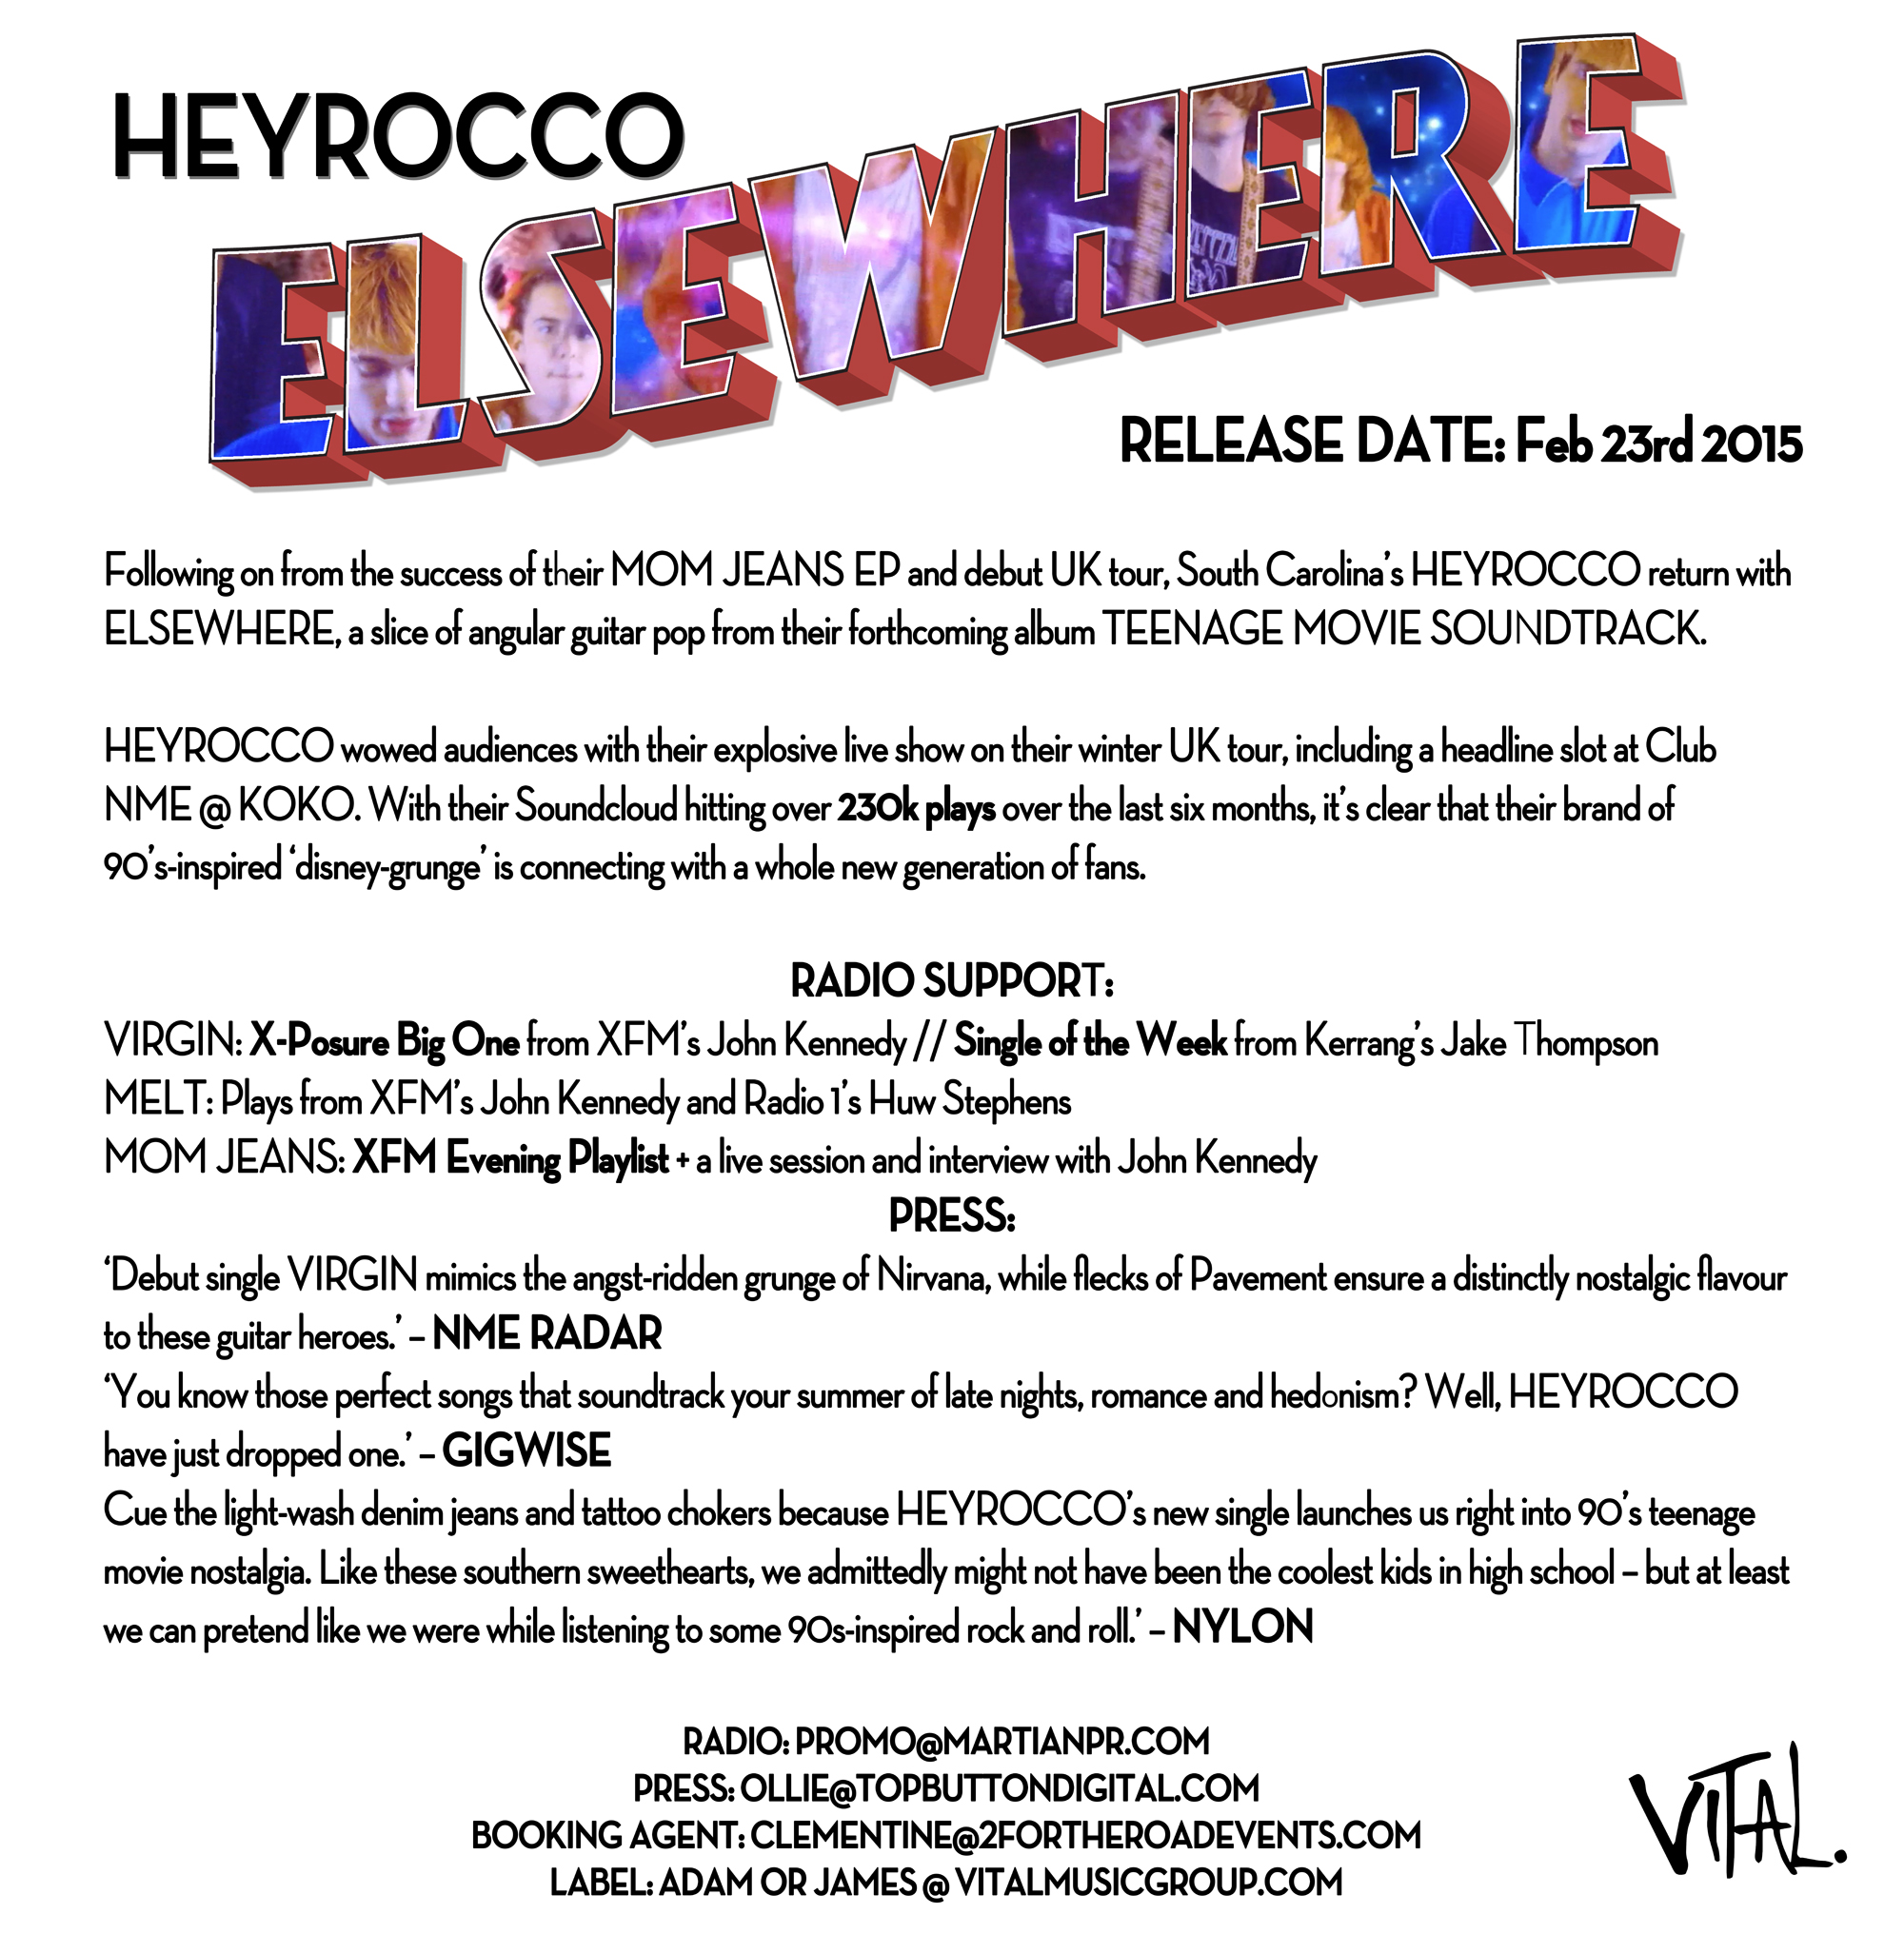 Heyrocco - ELSEWHERE PR Info